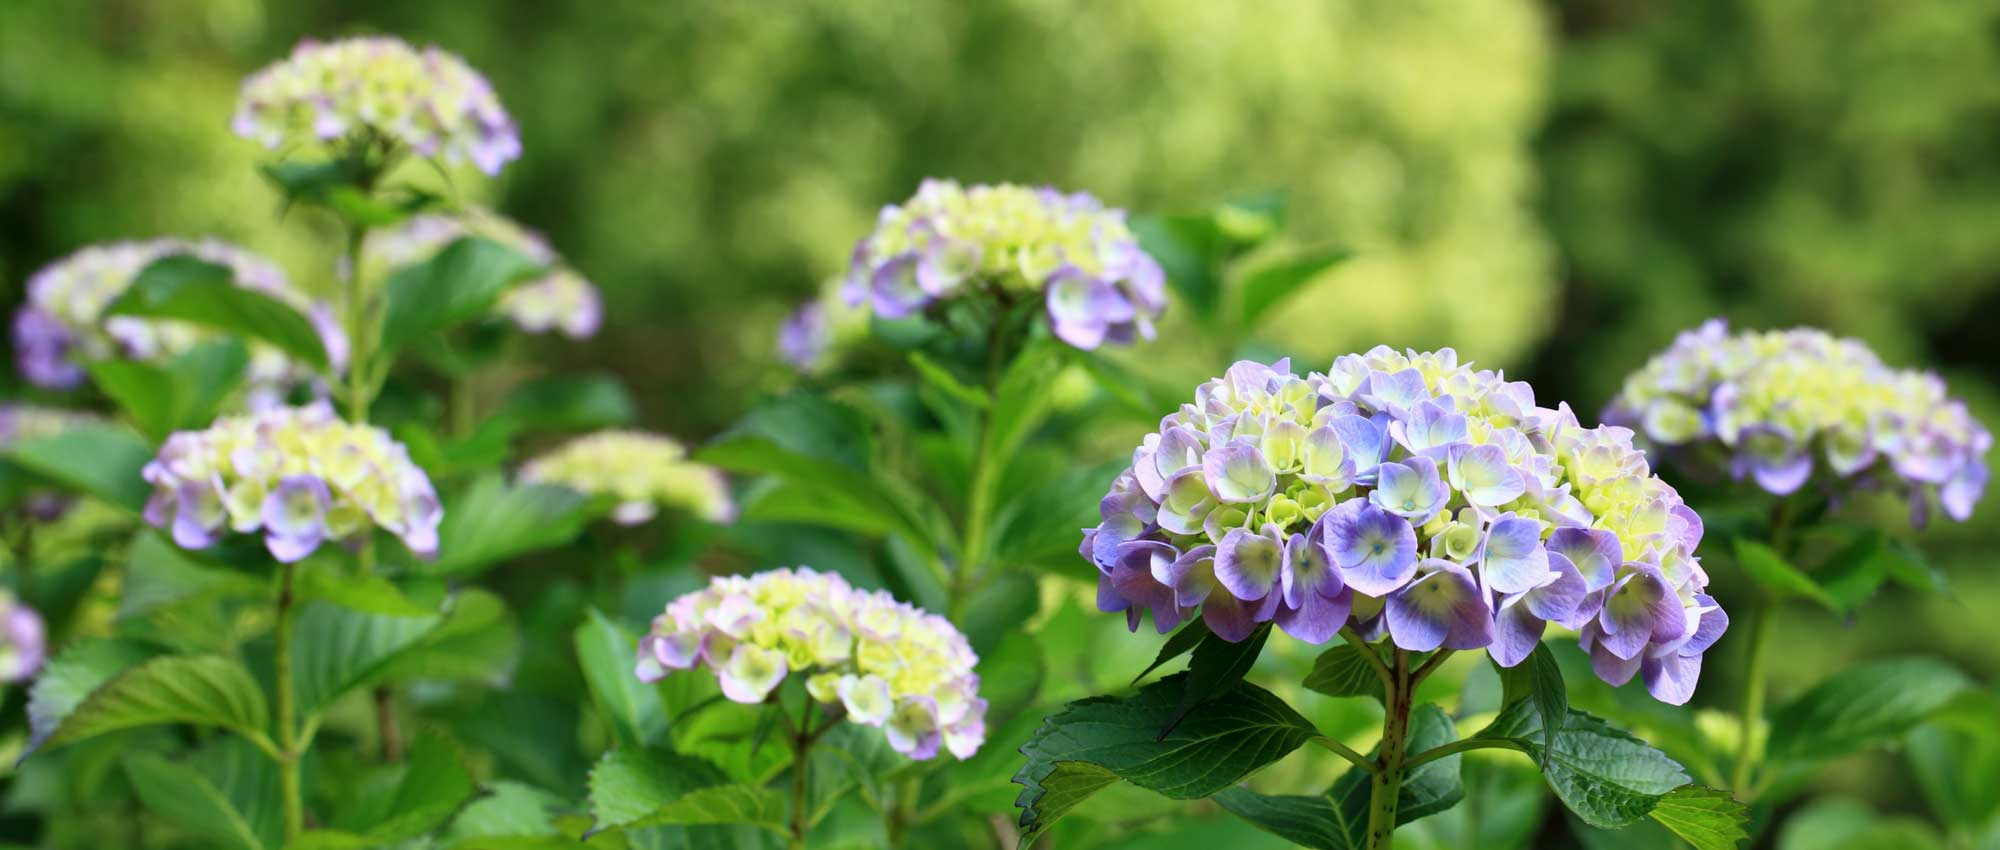 hortensia hydrangea quelle vari t choisir nos conseils promesse de fleurs. Black Bedroom Furniture Sets. Home Design Ideas